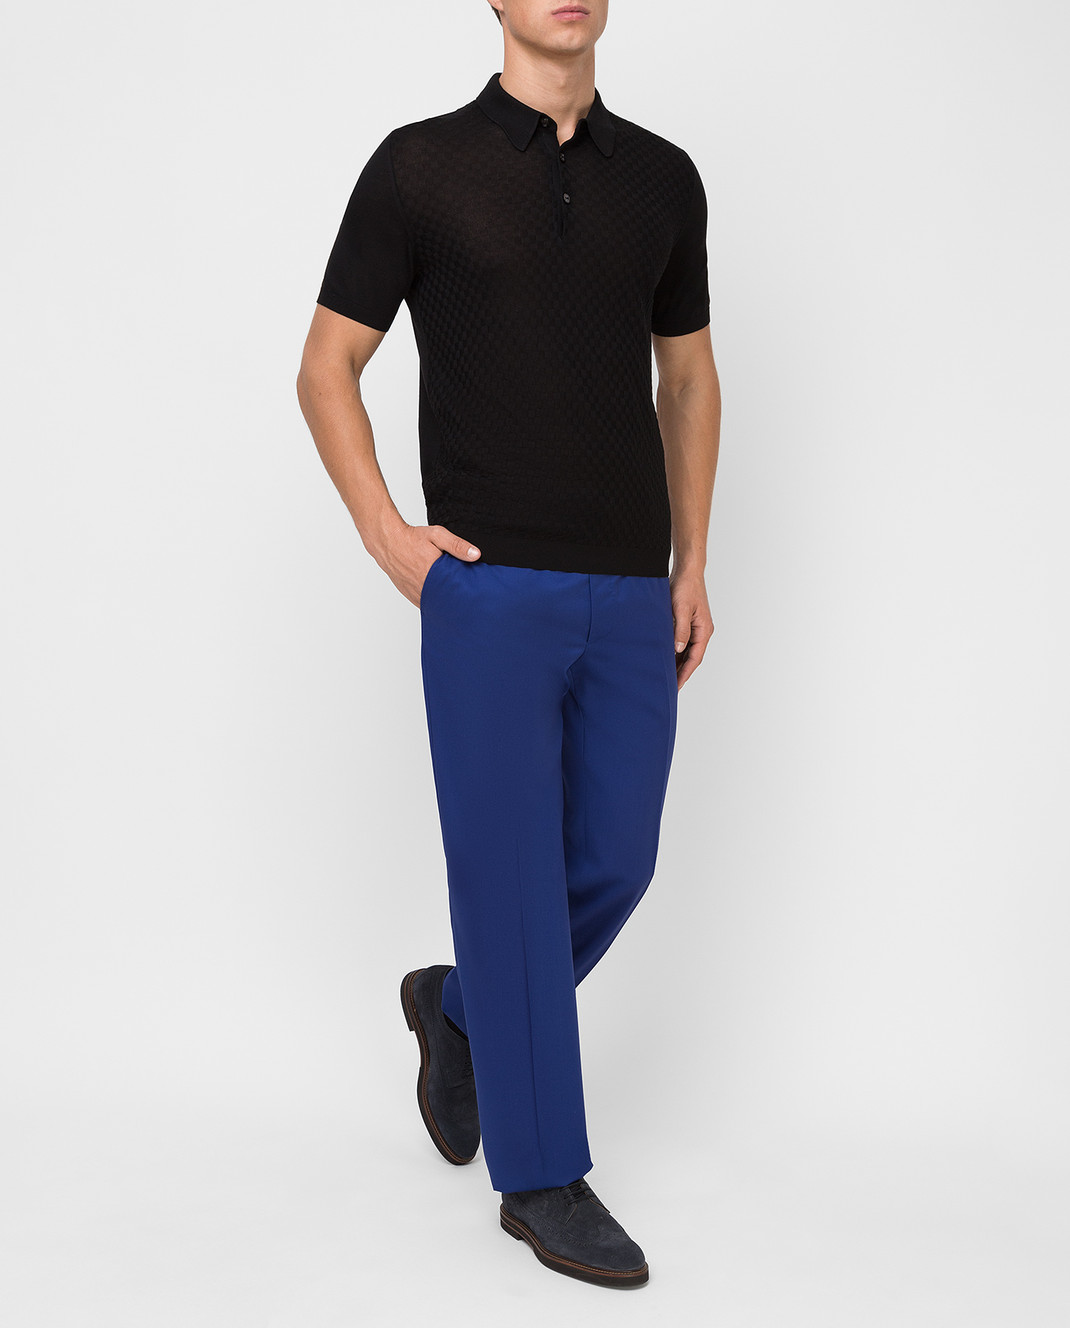 Castello d'Oro Синие брюки из шерсти изображение 2